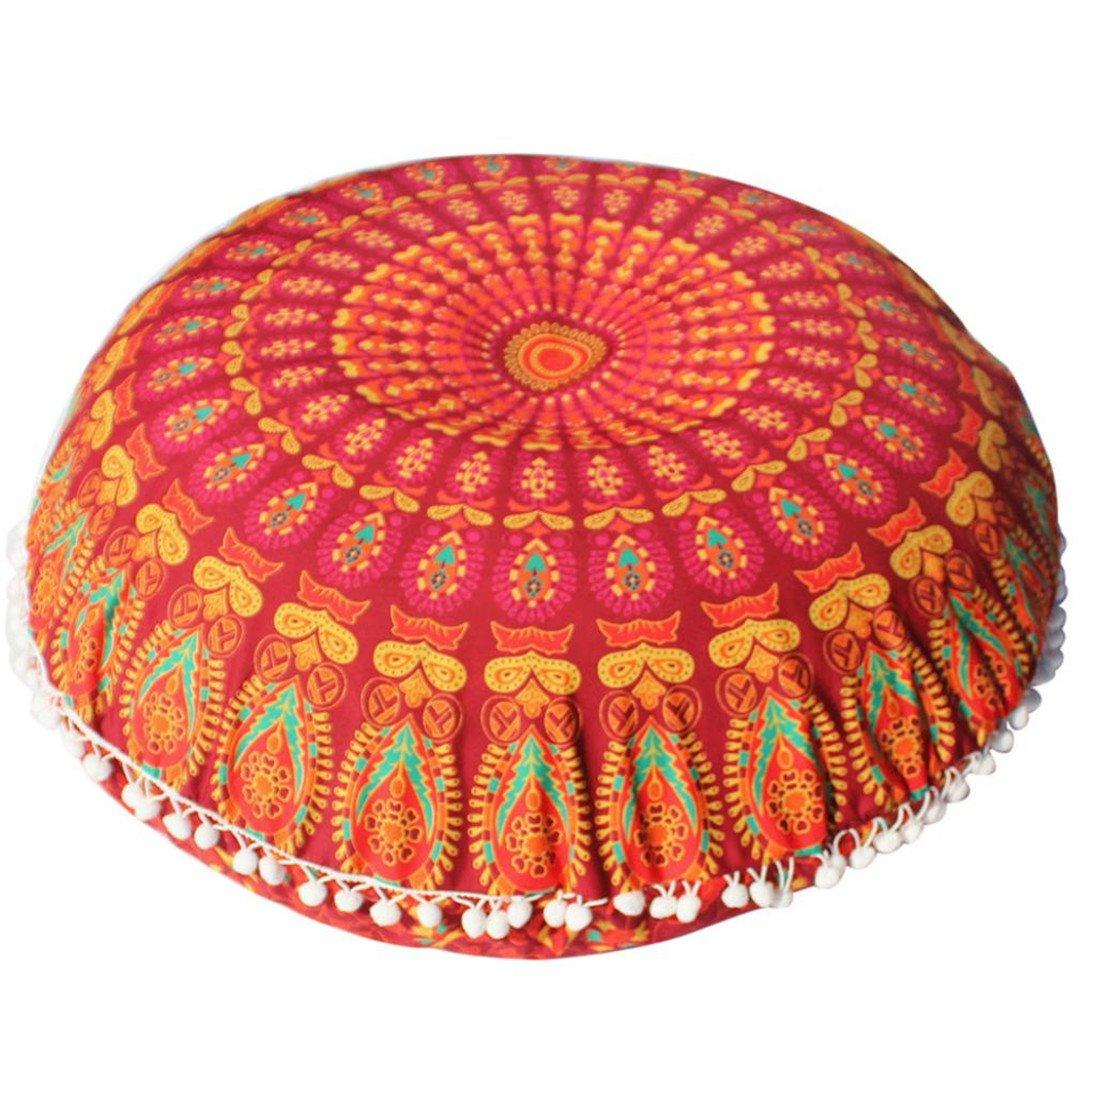 Btruely Bodenkissen Groß Mandala Stock Kissen Runden Bohemien Meditation Cushion Cover Ottomane Puff Btruely_4034